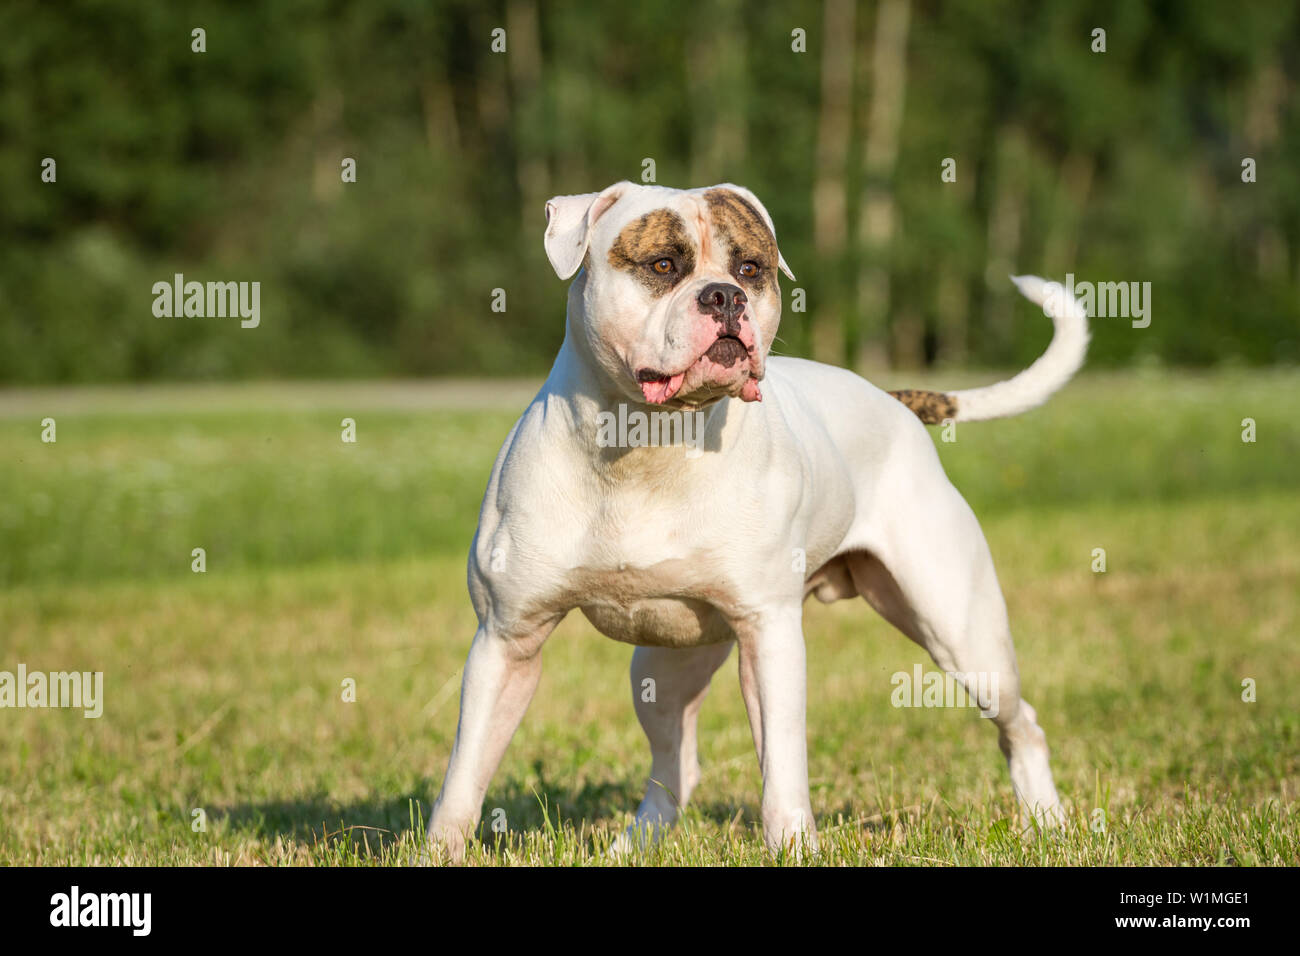 Bulldogge Mit Augenklappe Stockfotos Bulldogge Mit Augenklappe